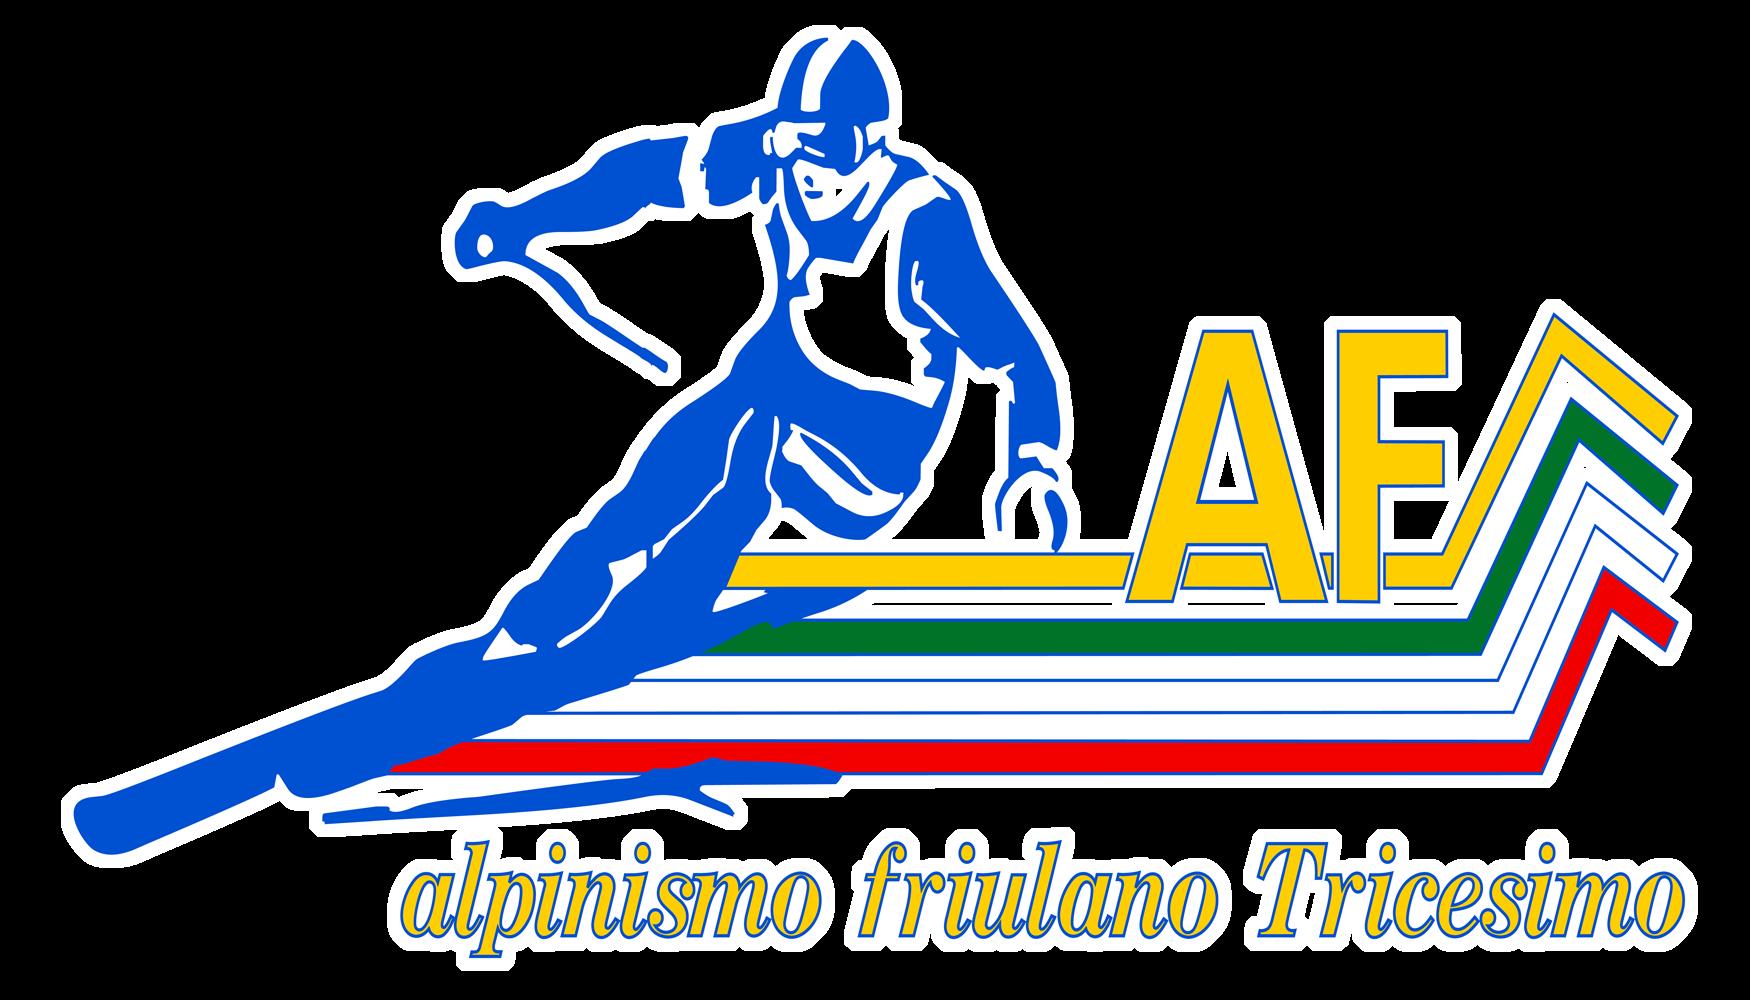 Alpinismo Friulano Tricesimo